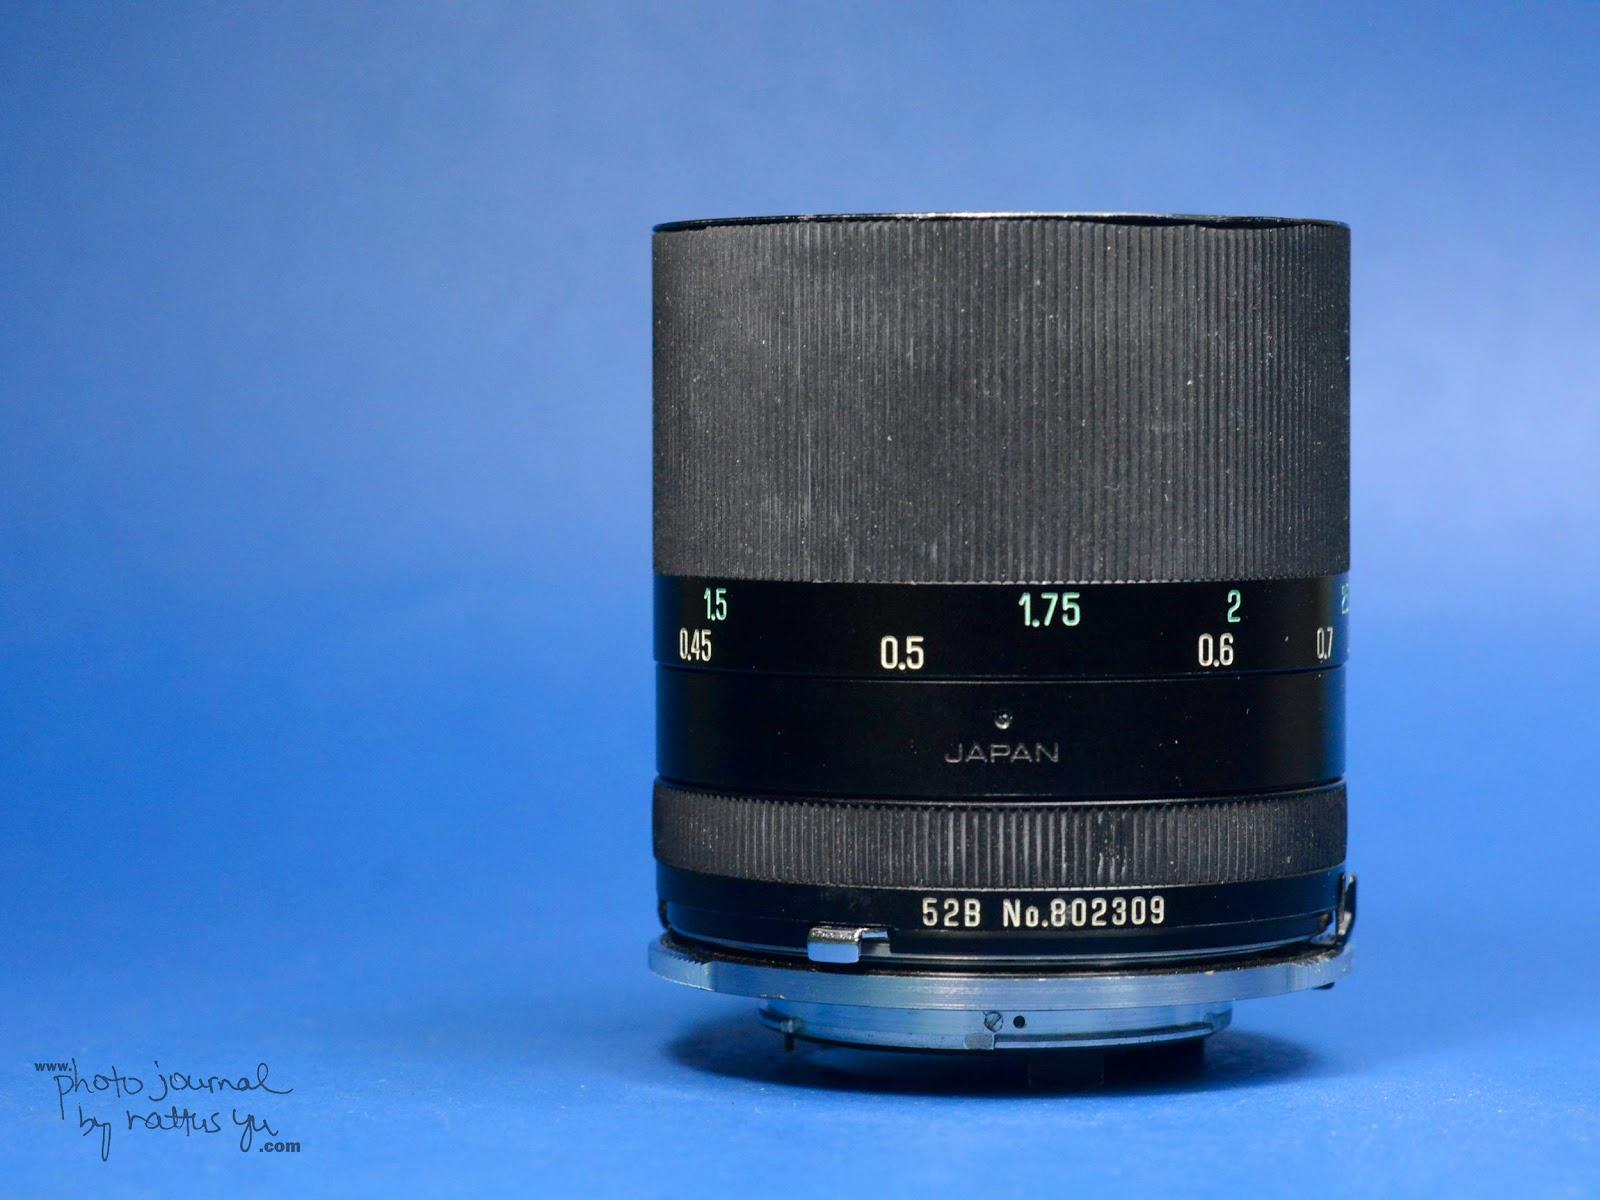 Tamron Adaptall 90mm f/2.5 Macro (Model 52B)